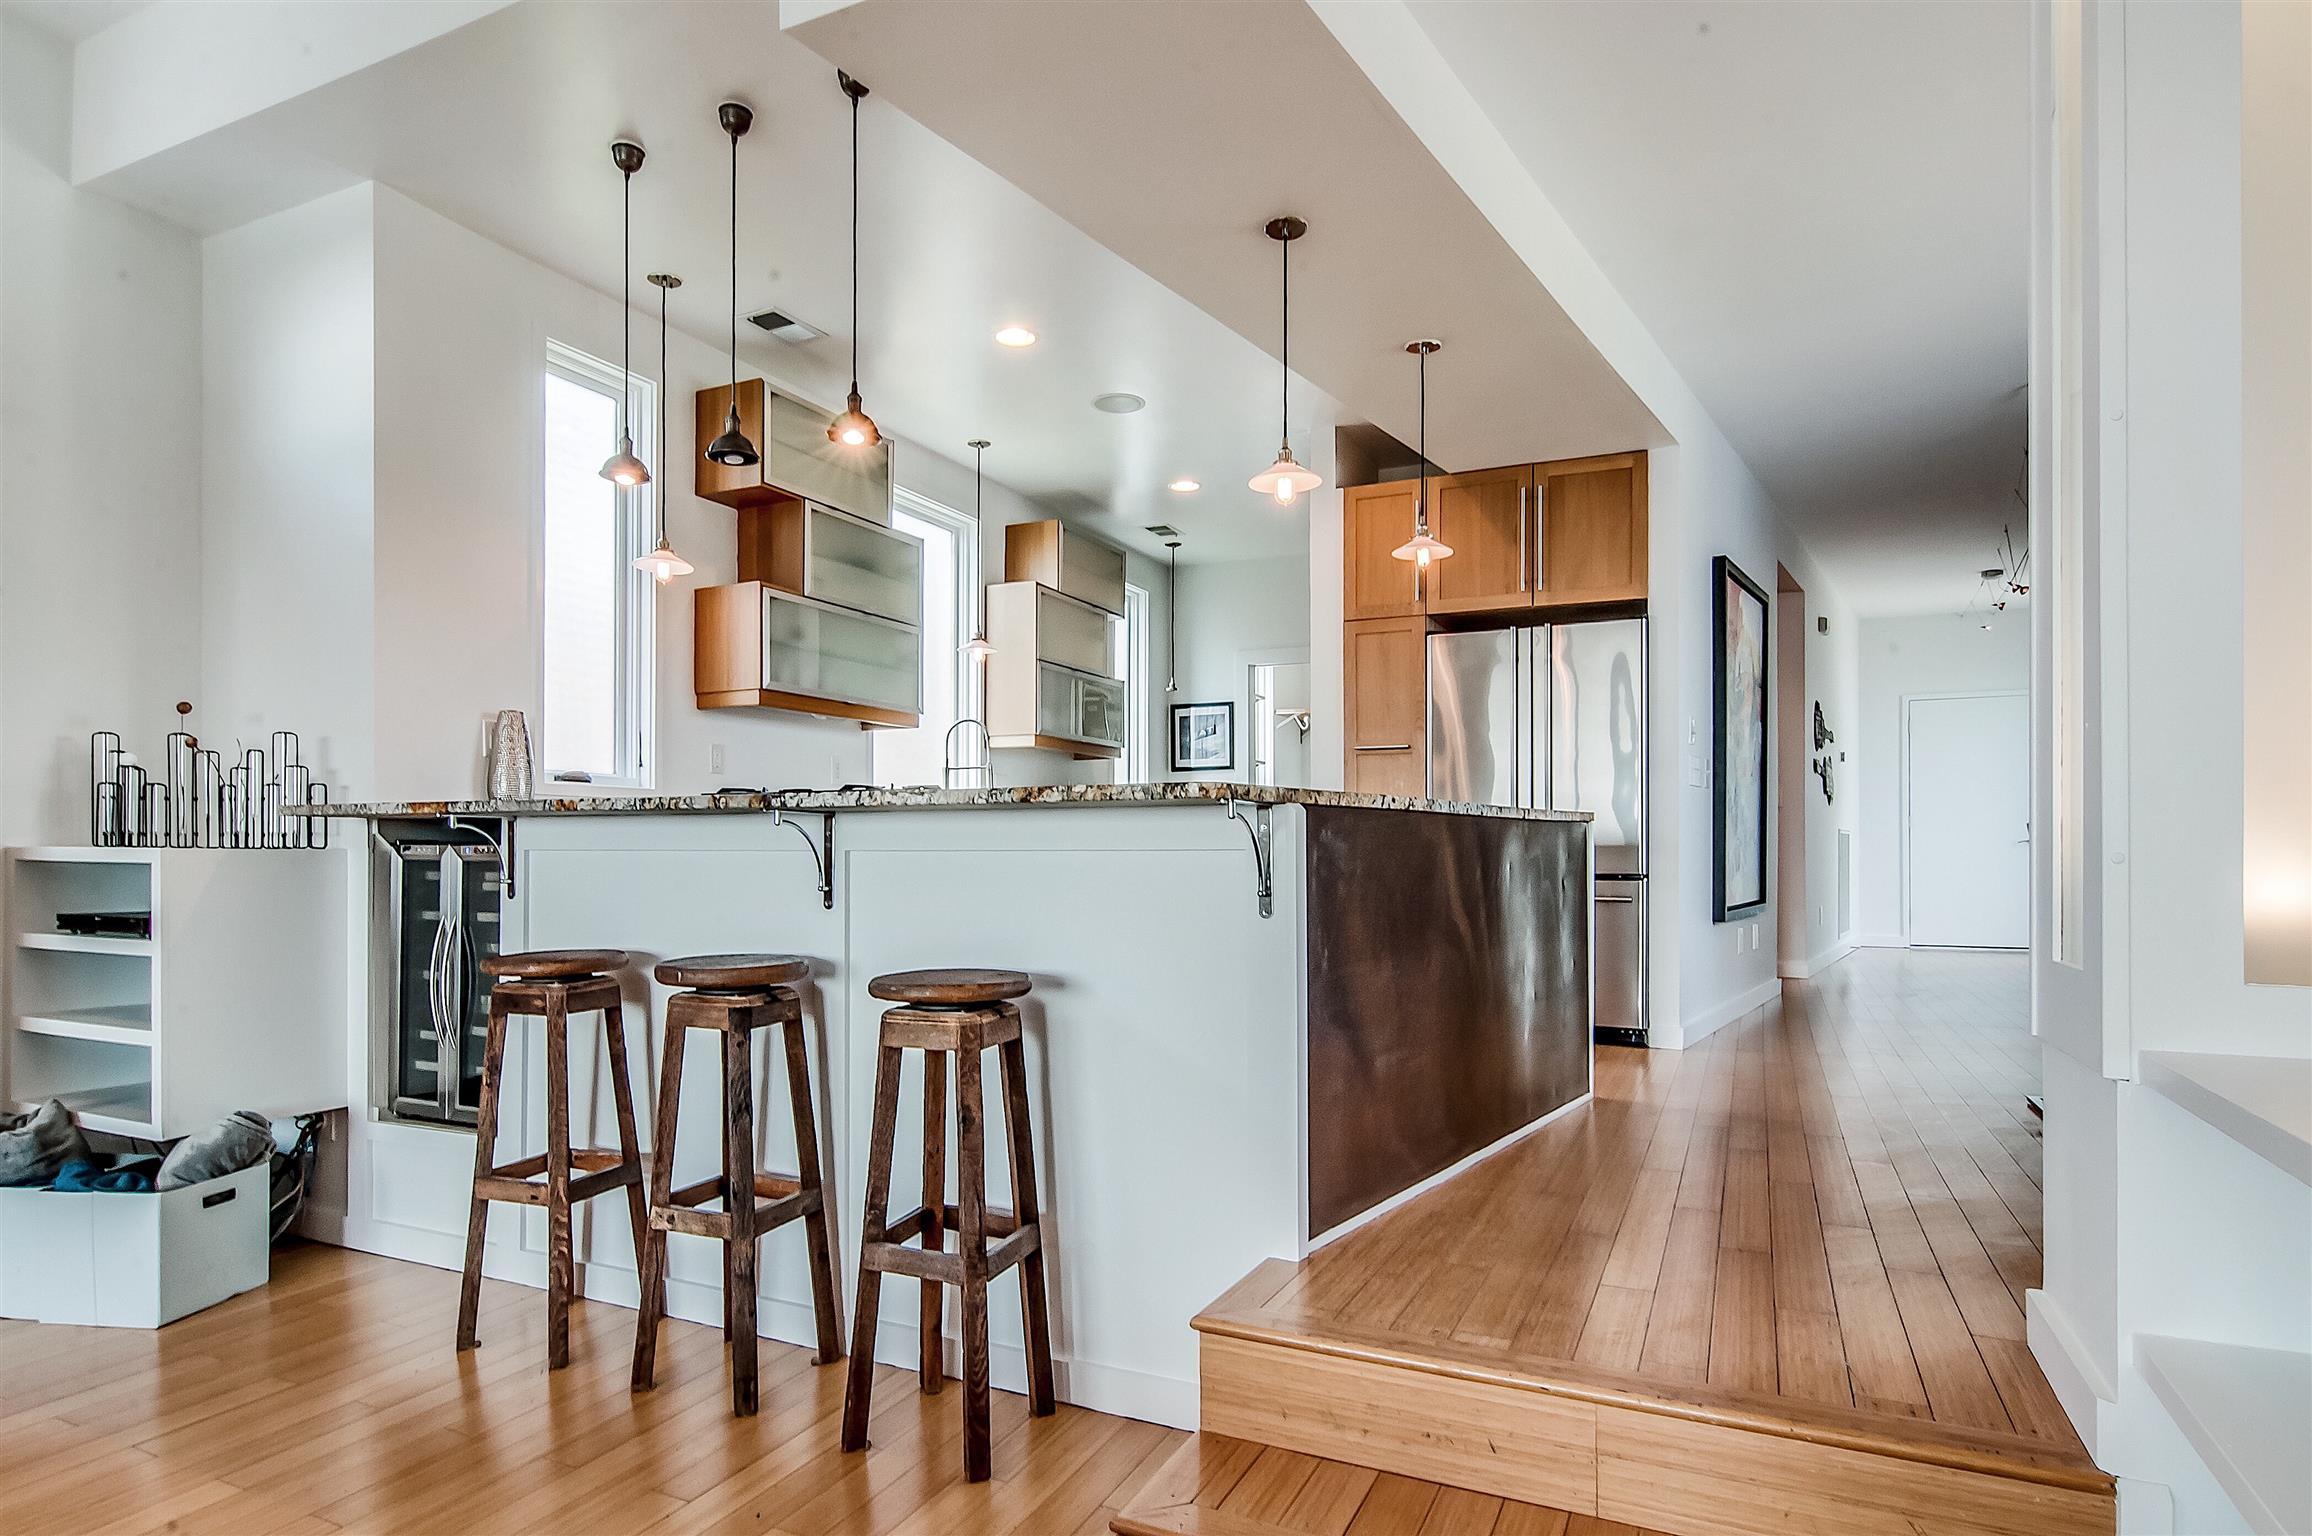 cheap hardwood flooring nashville tn of 253 33rd ave n nashville sylvan heights 1957933 intended for property image of 253 33rd ave n in nashville tn